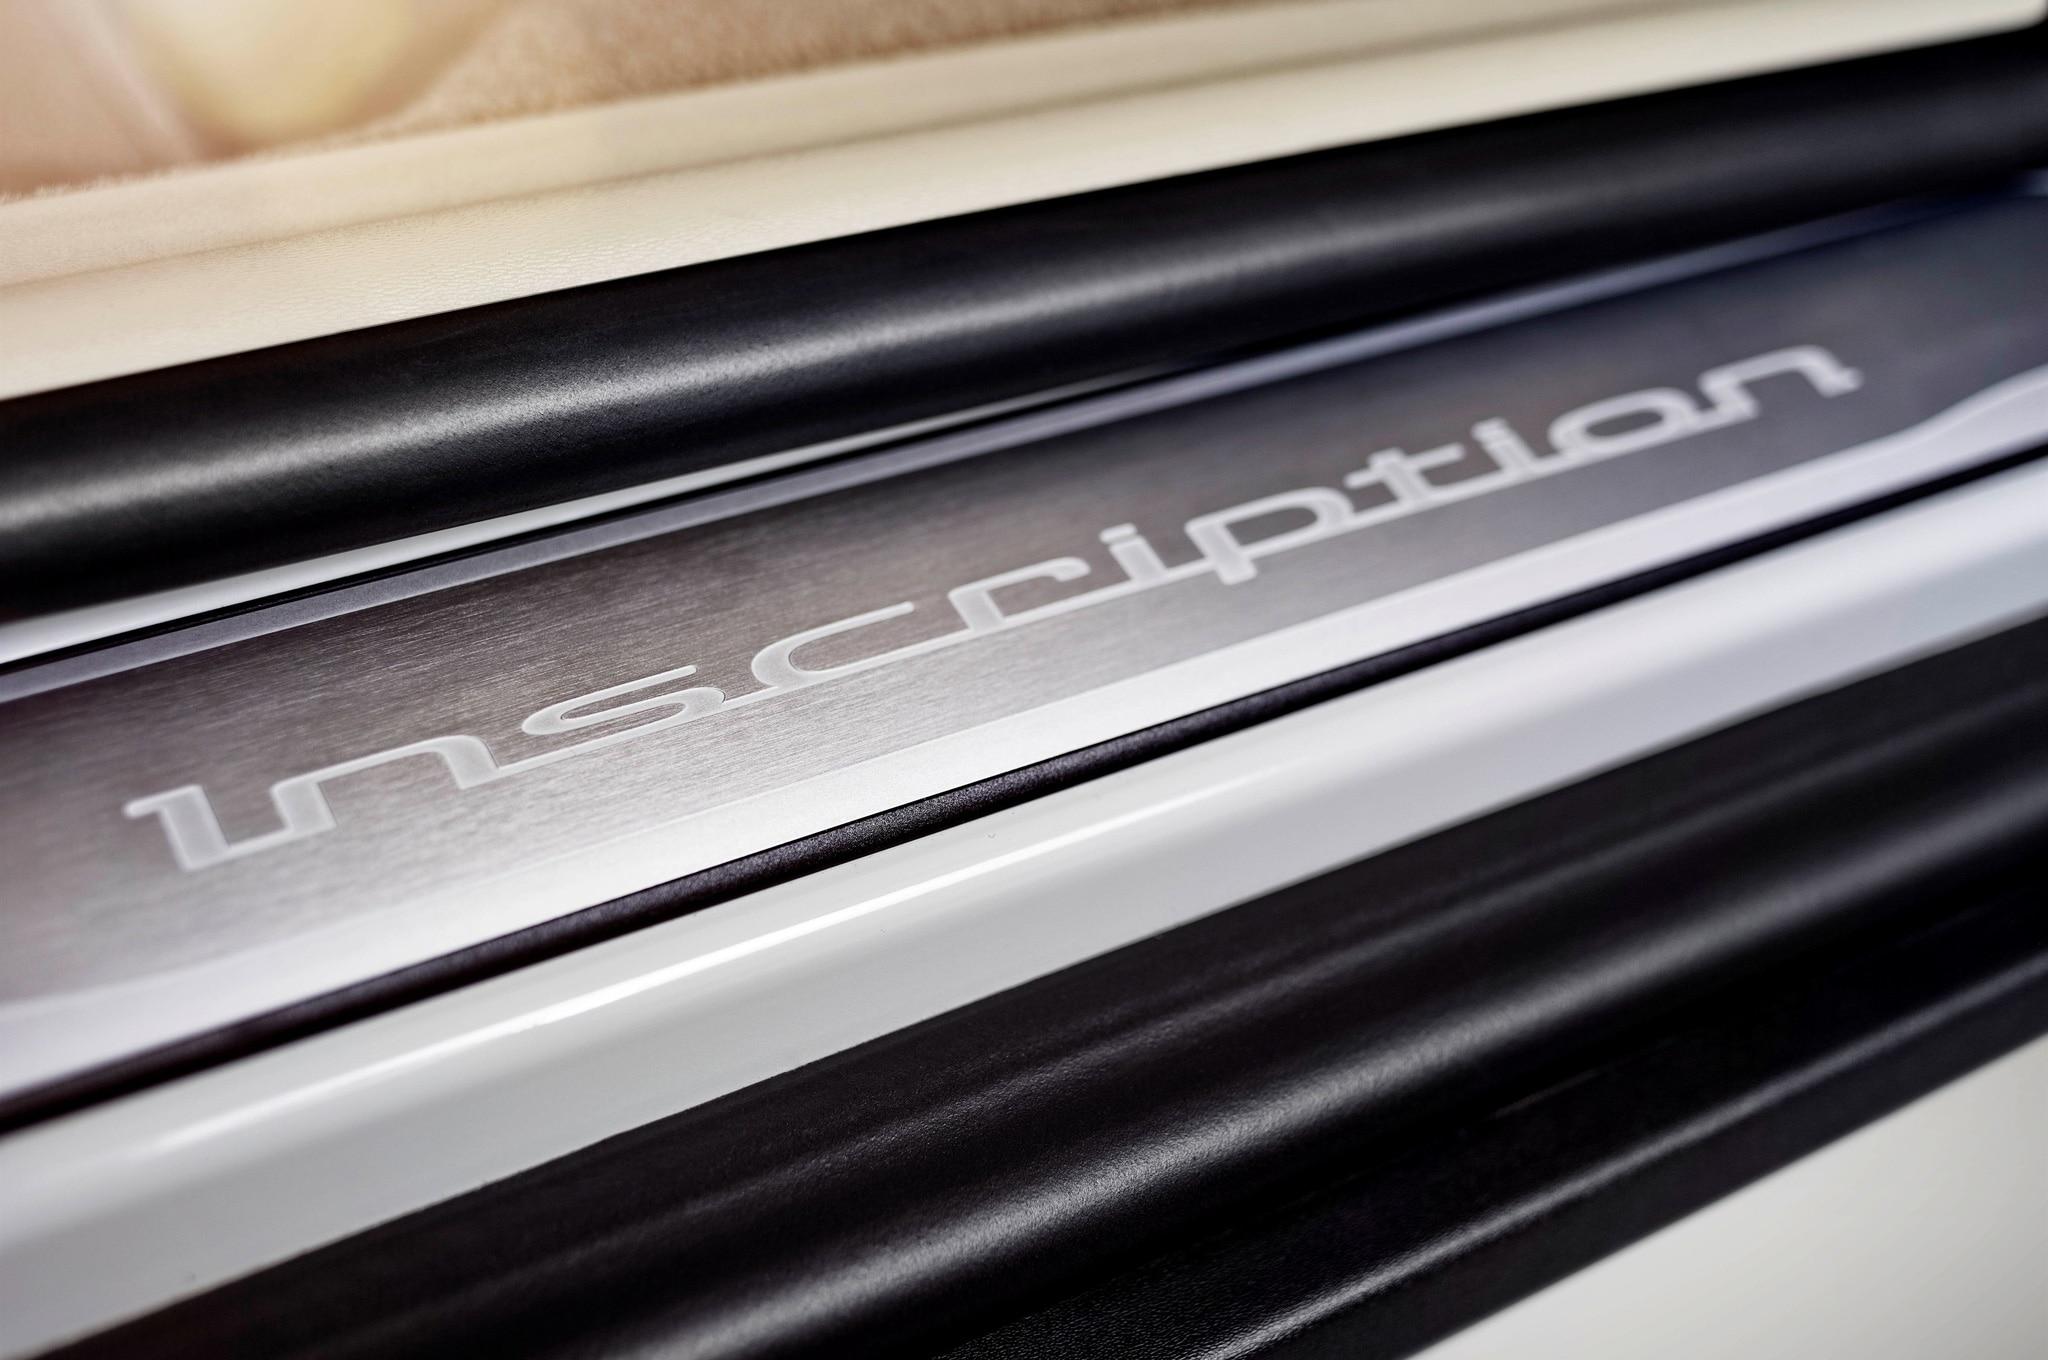 2015 Volvo Xc60 S80 Add Inscription Package Automobile Magazine